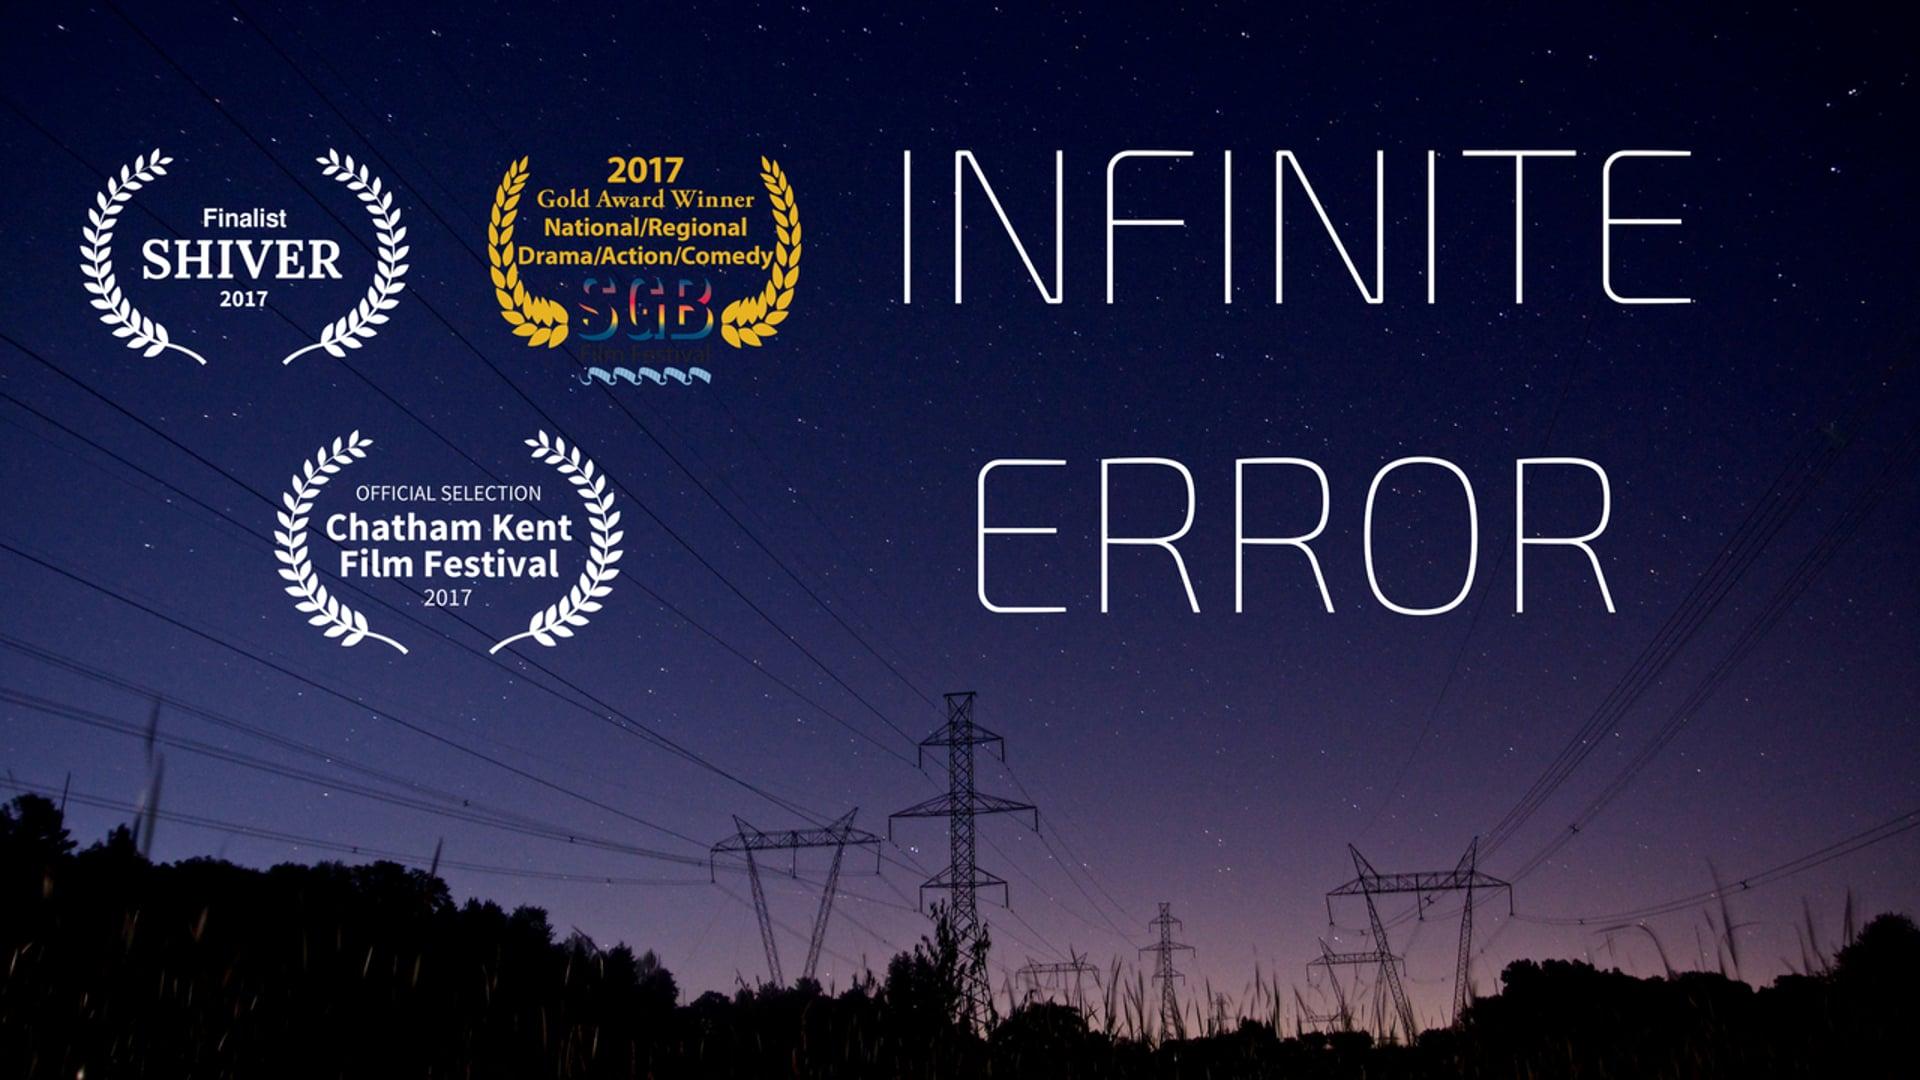 Infinite Error